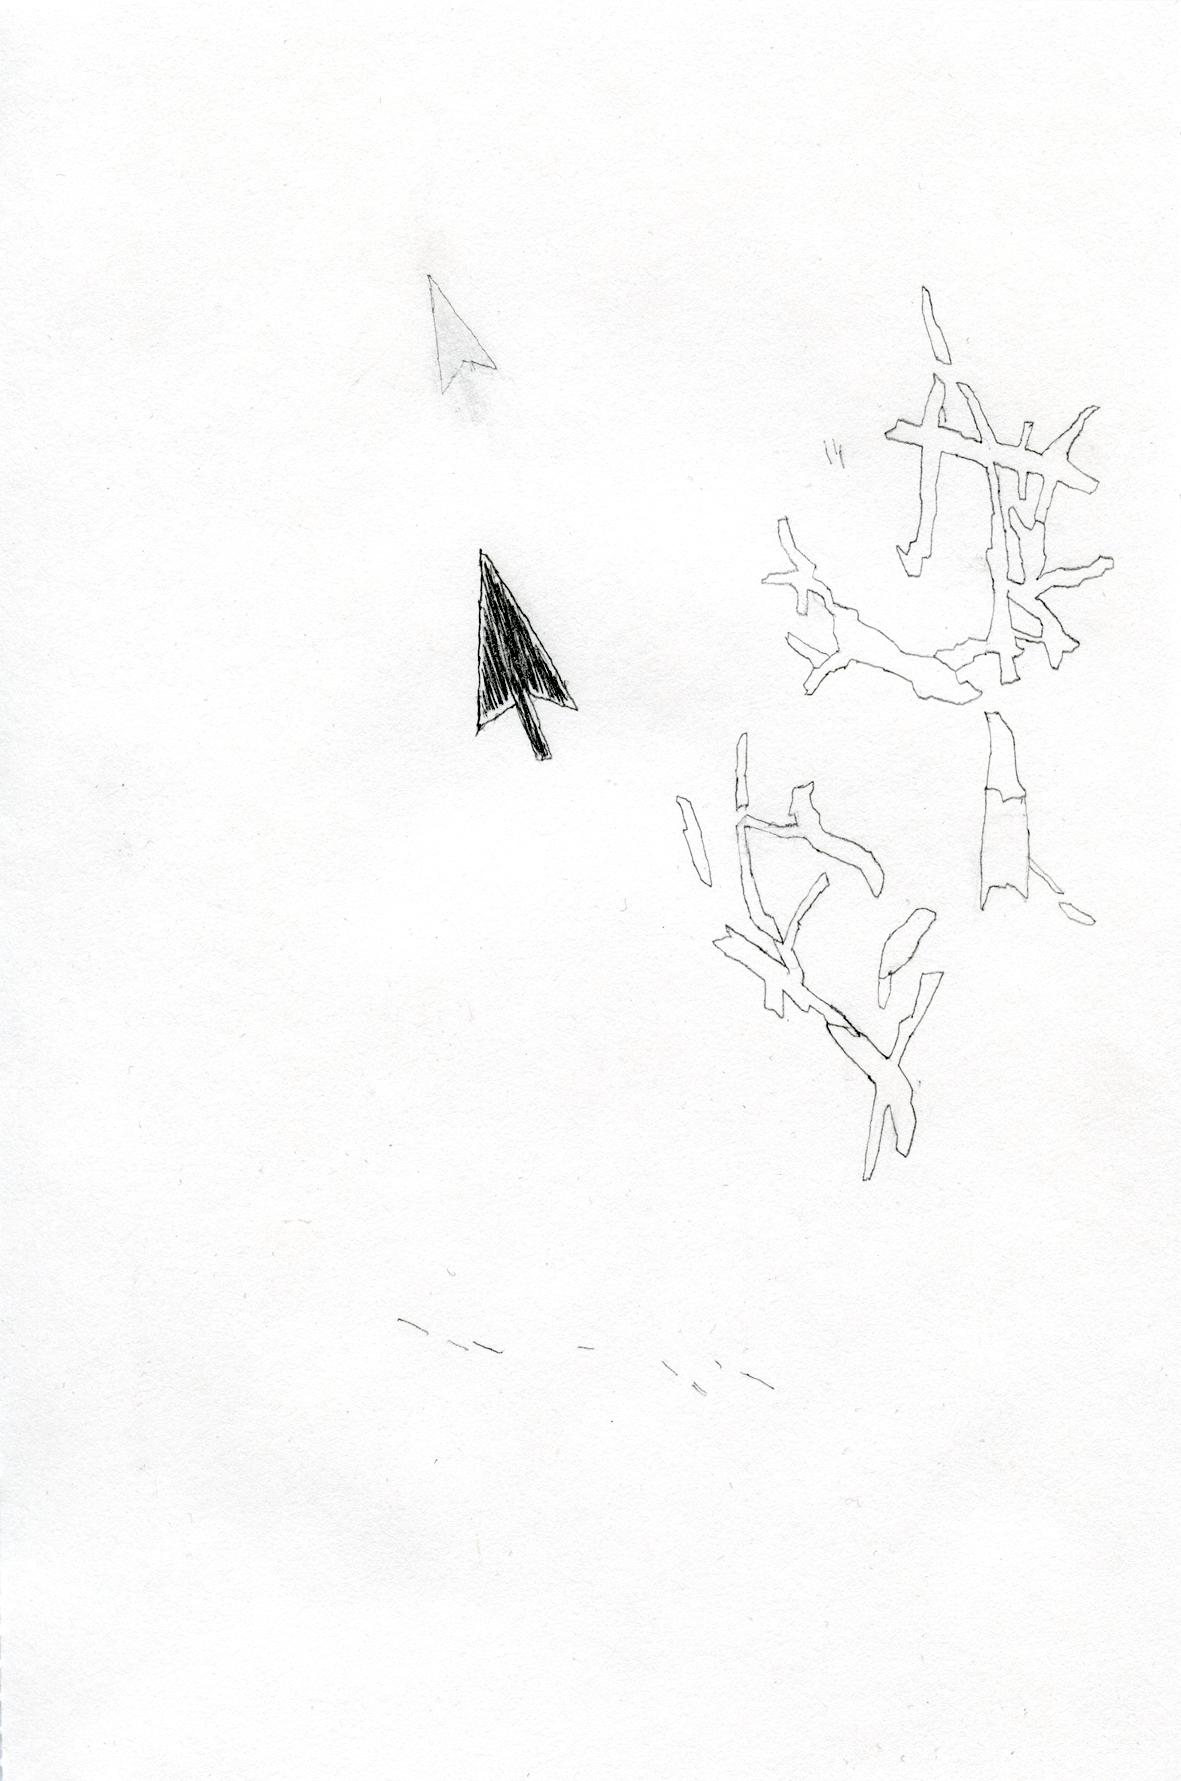 interim/screen  pencil on paper, 14 x 21 cm